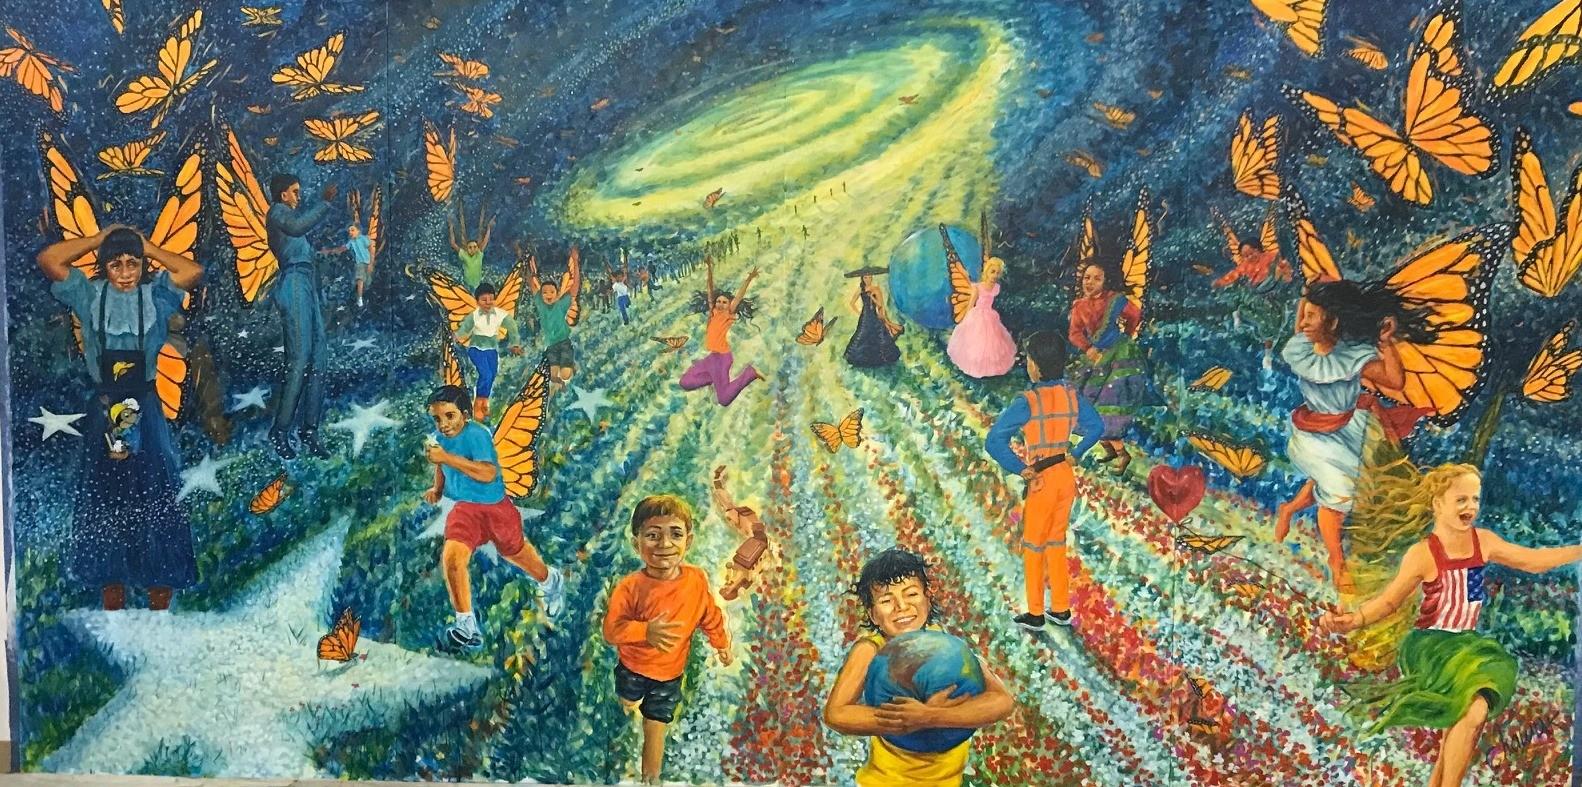 Butterfly children mural in West Chicago Illinois